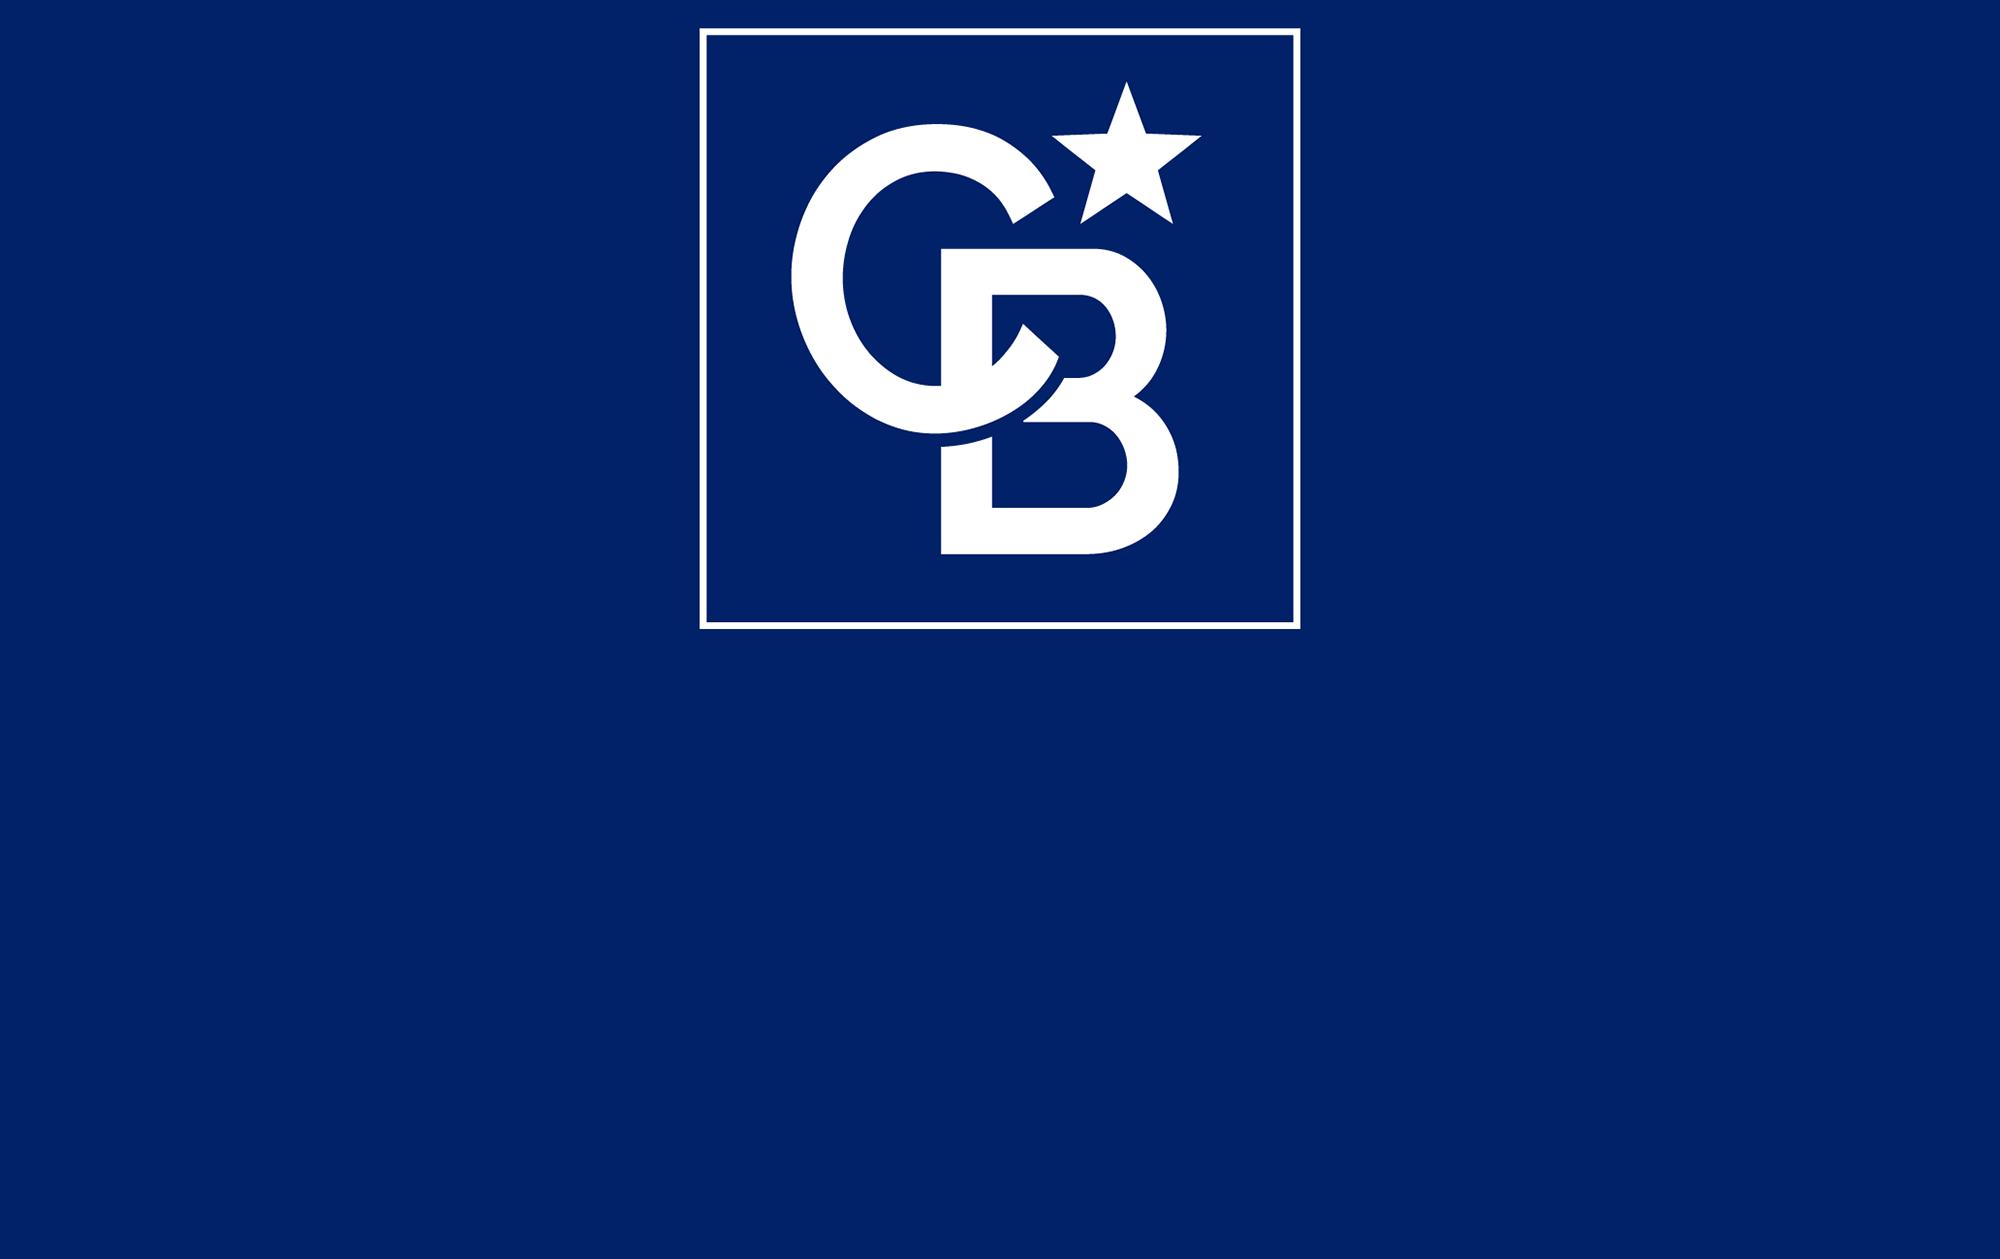 cbhb05 Logo